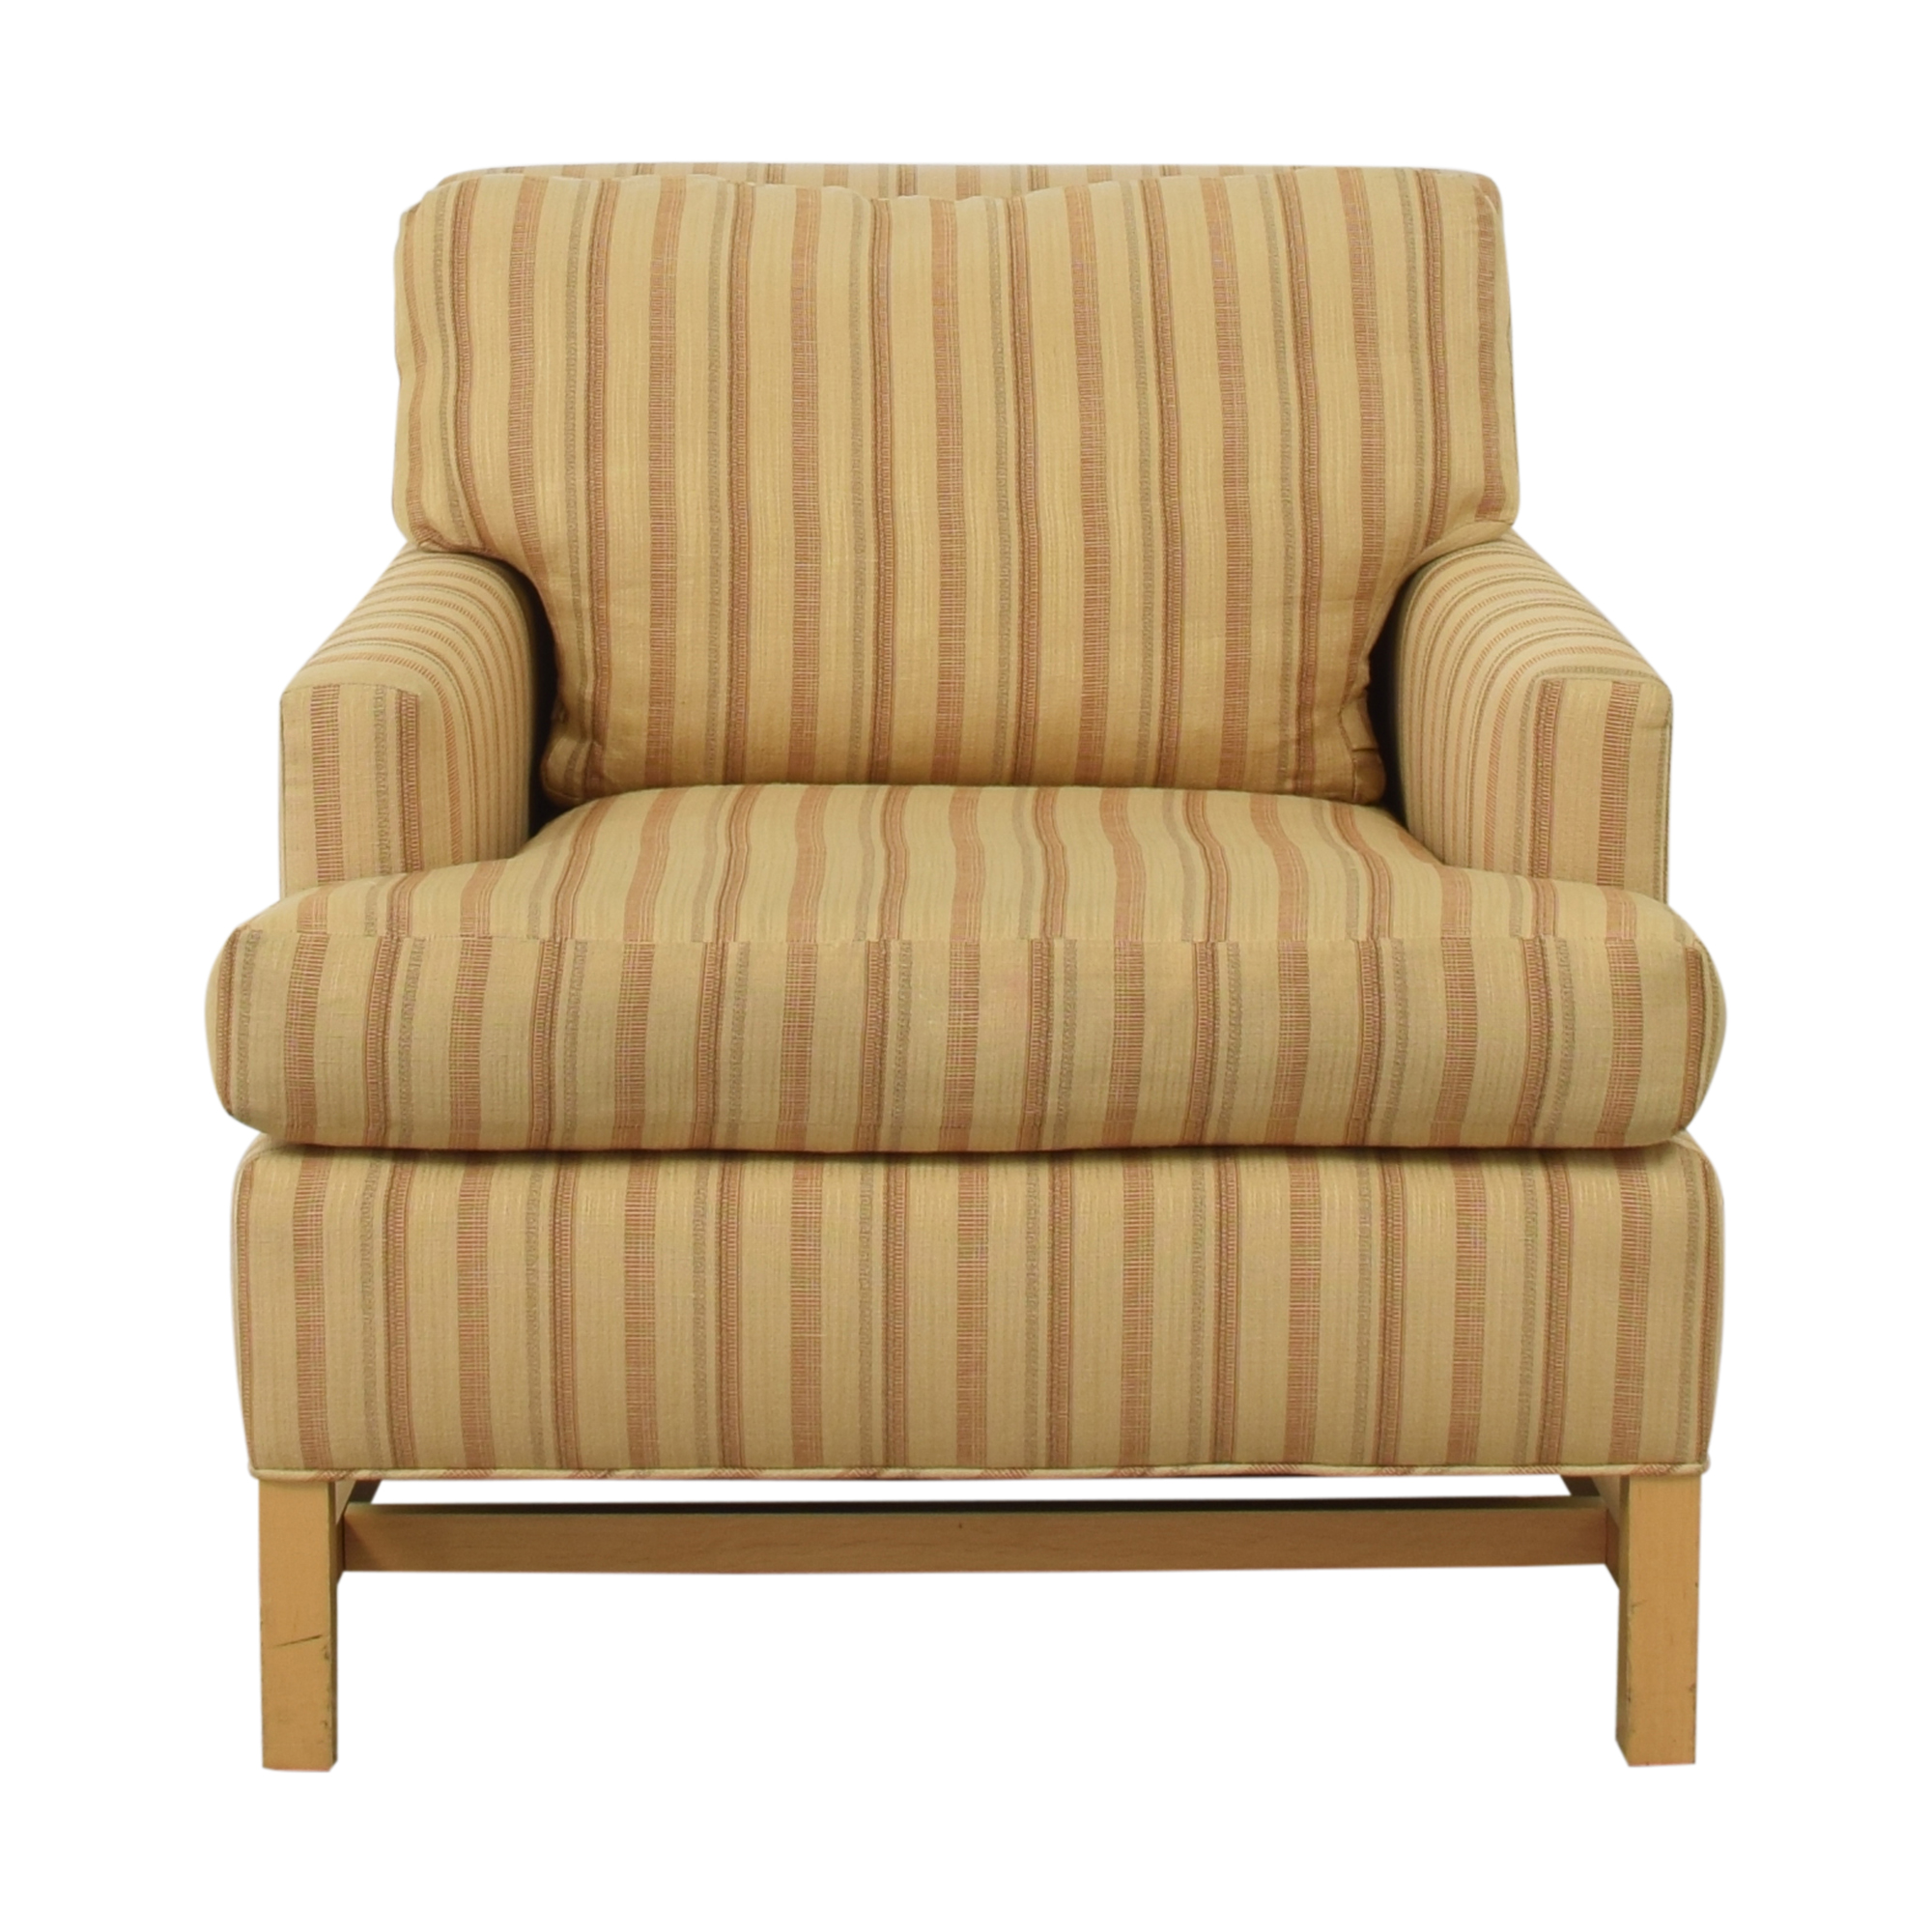 Summer Hill Summer Hill Arm Chair nj